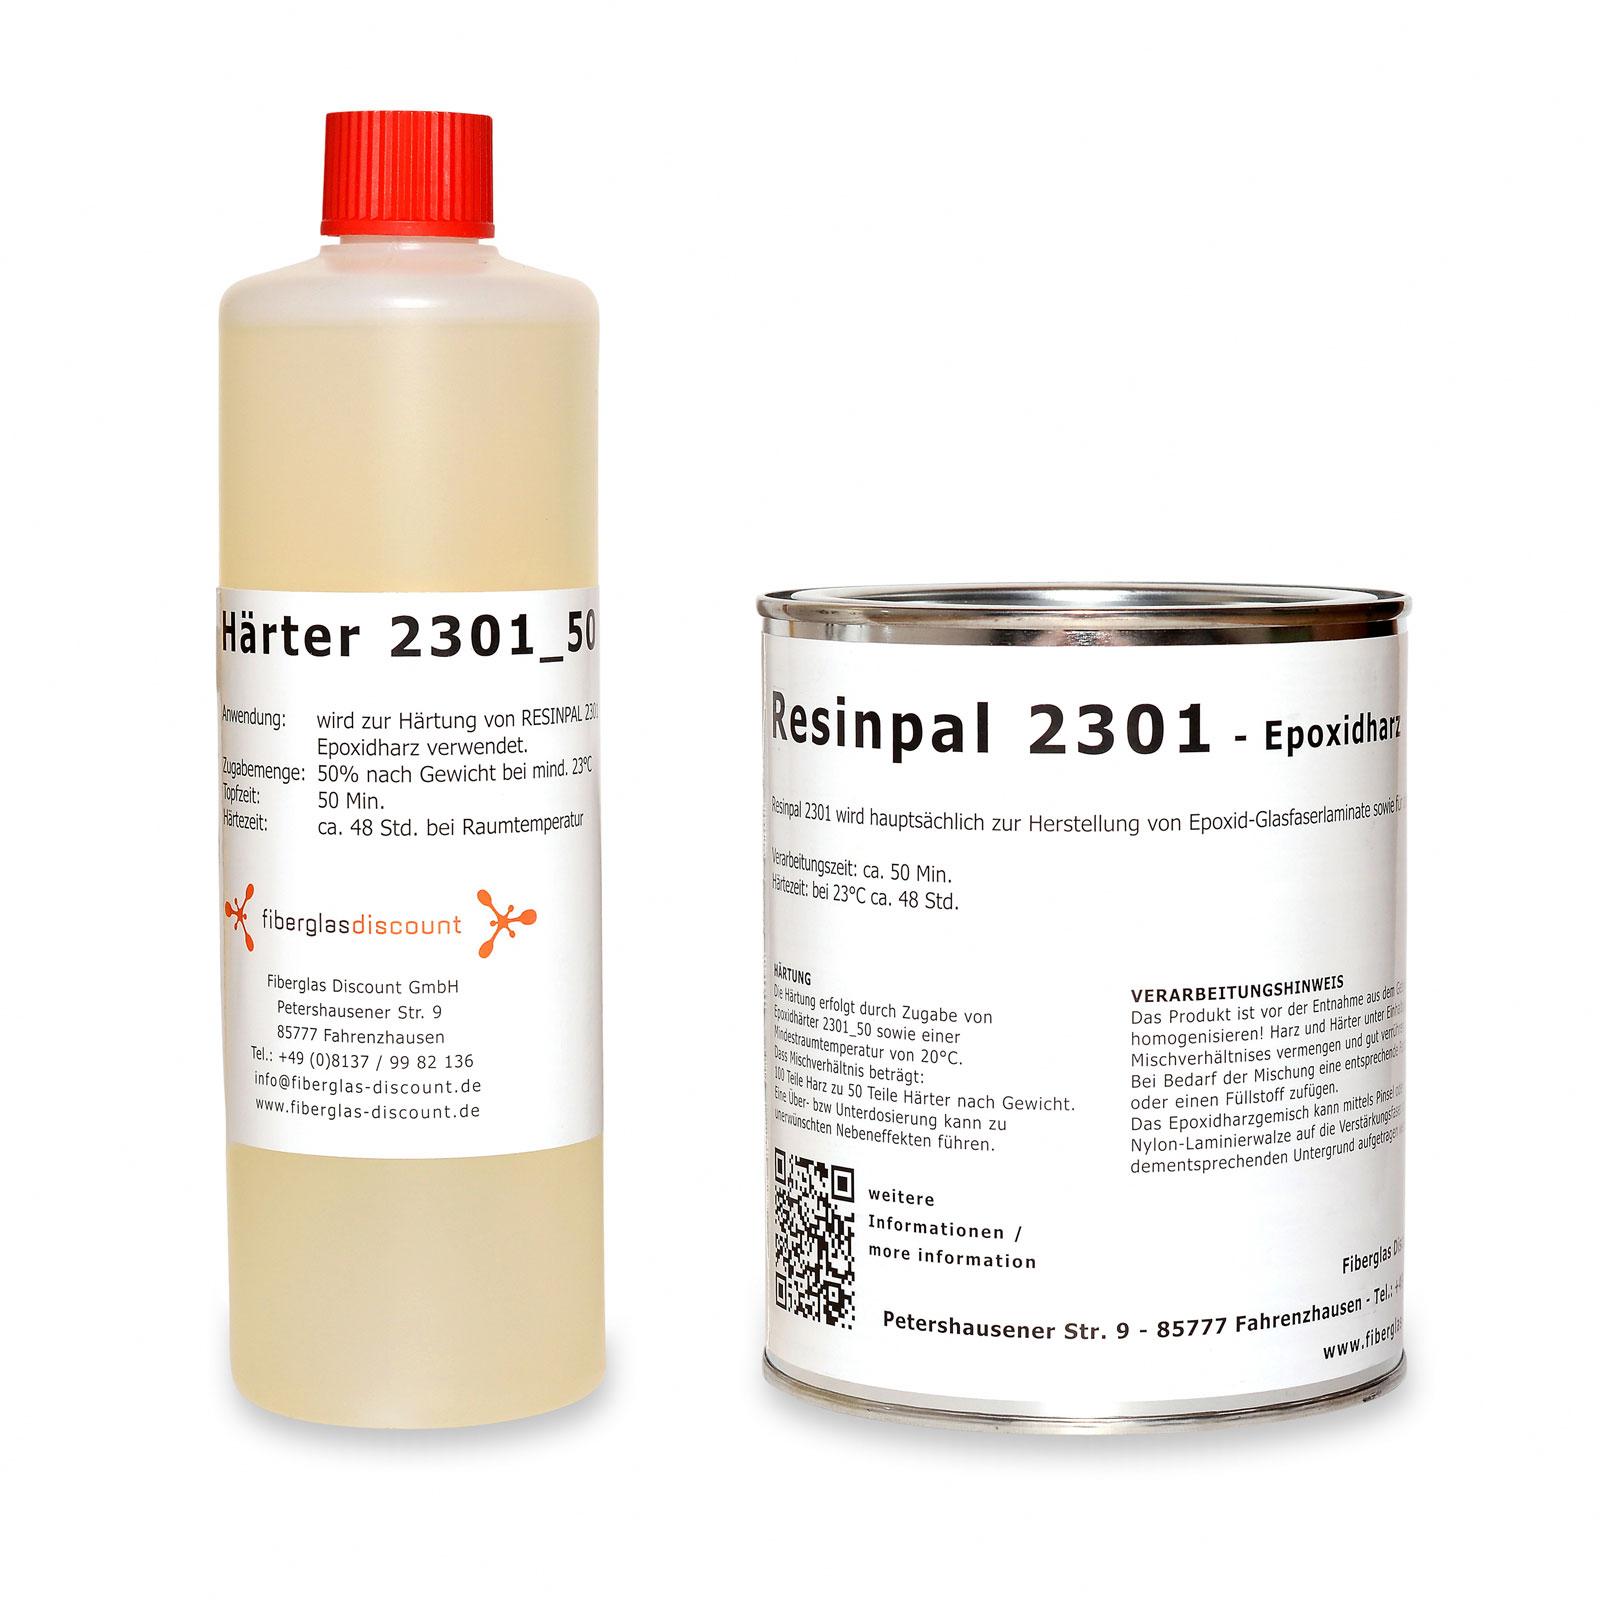 1 5 kg epoxidharz resinpal 2301 h rter epoxydharz epoxy resin epoxy ebay. Black Bedroom Furniture Sets. Home Design Ideas